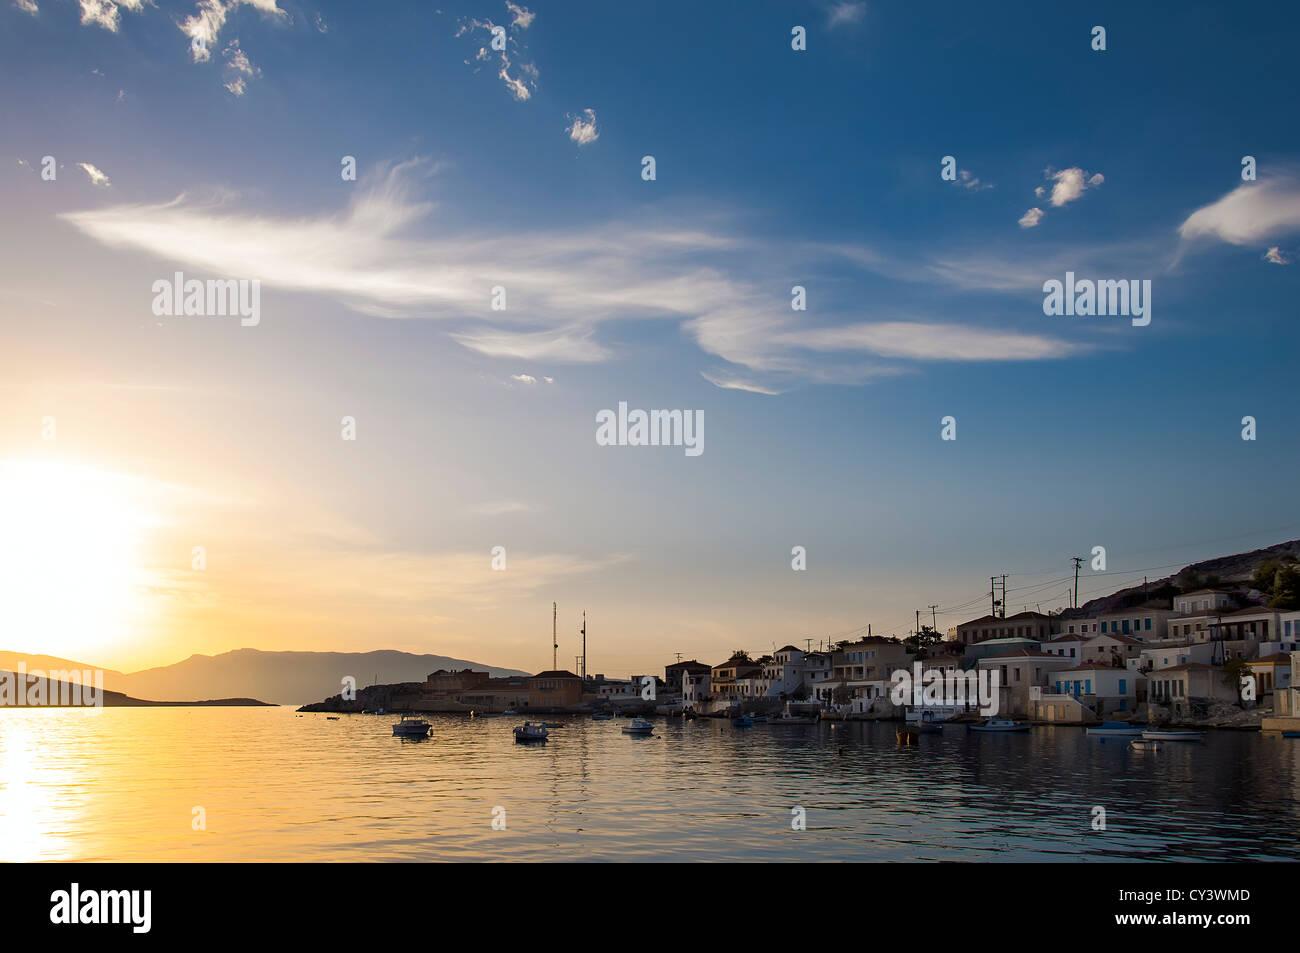 Sunrise in Halki. - Stock Image